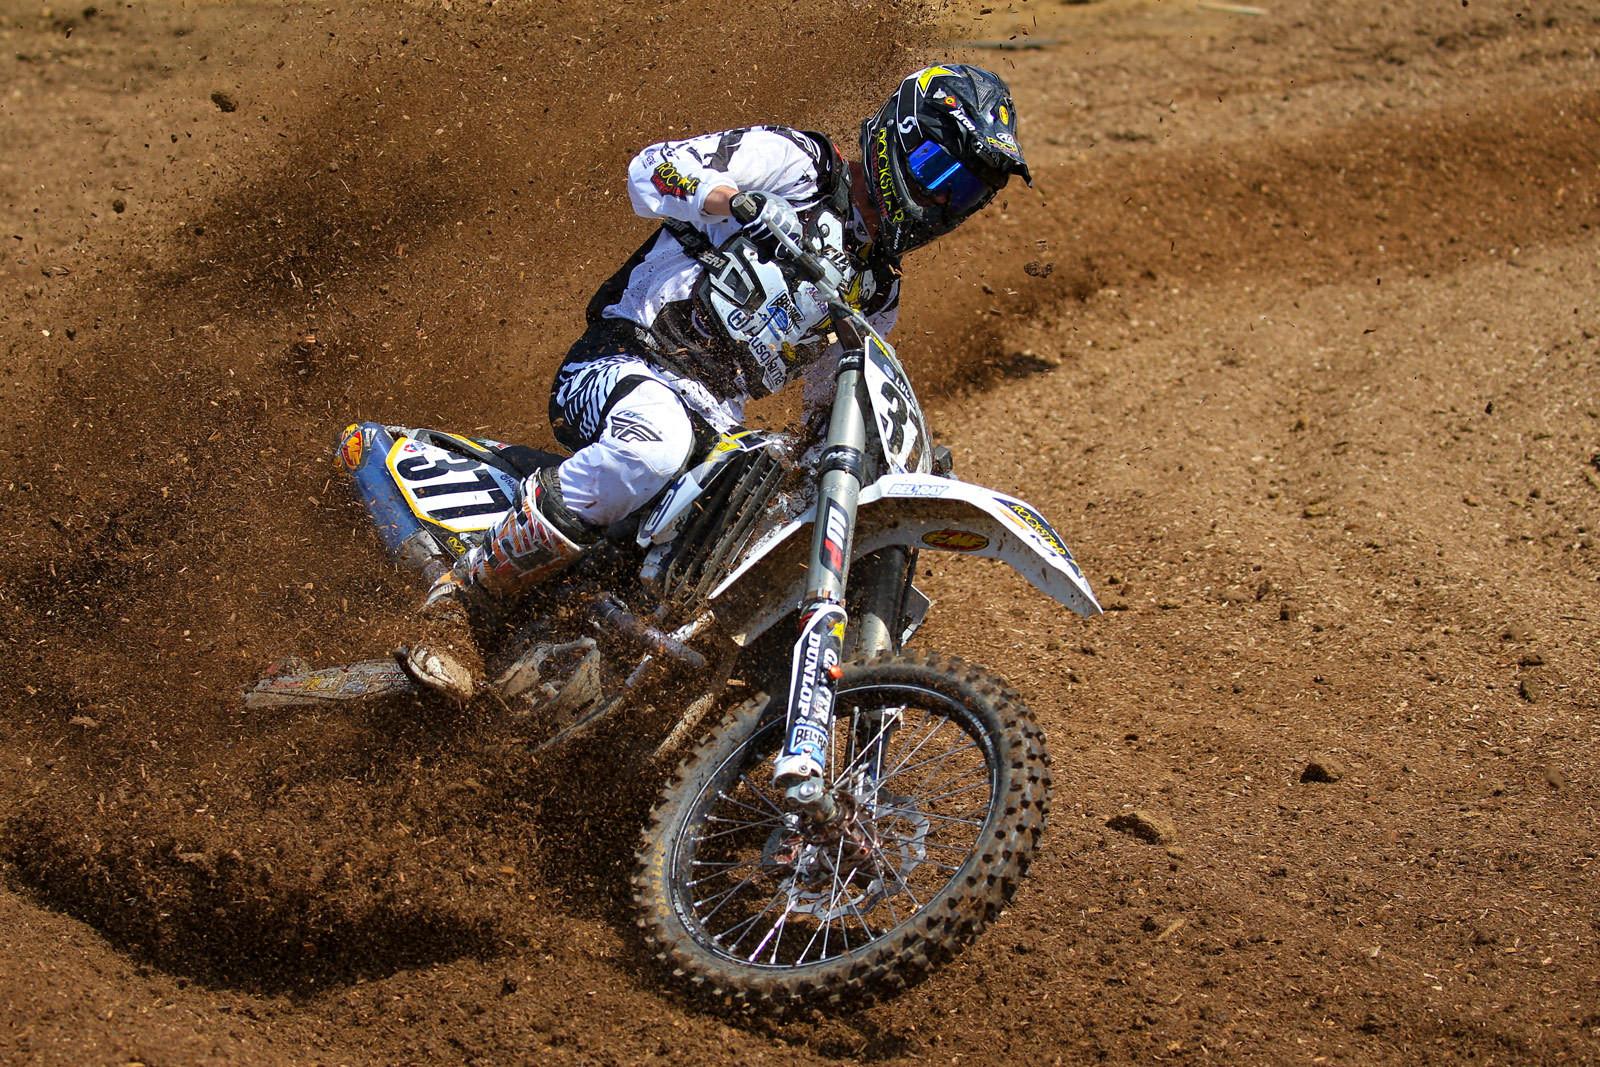 Christophe Pourcel - Vital MX Pit Bits: Muddy Creek - Motocross Pictures - Vital MX